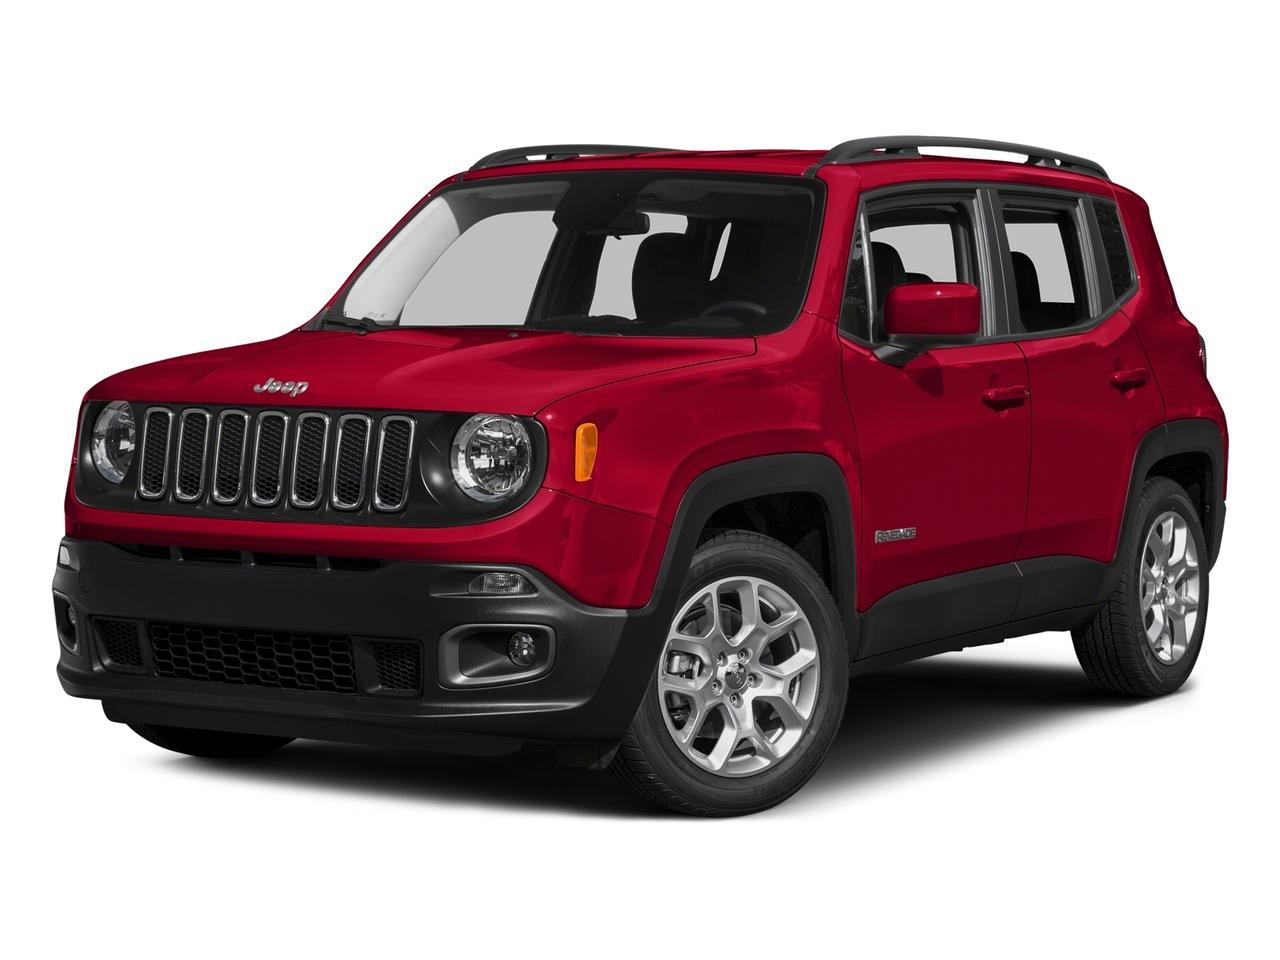 2015 Jeep Renegade Vehicle Photo in MIDLAND, TX 79703-7718